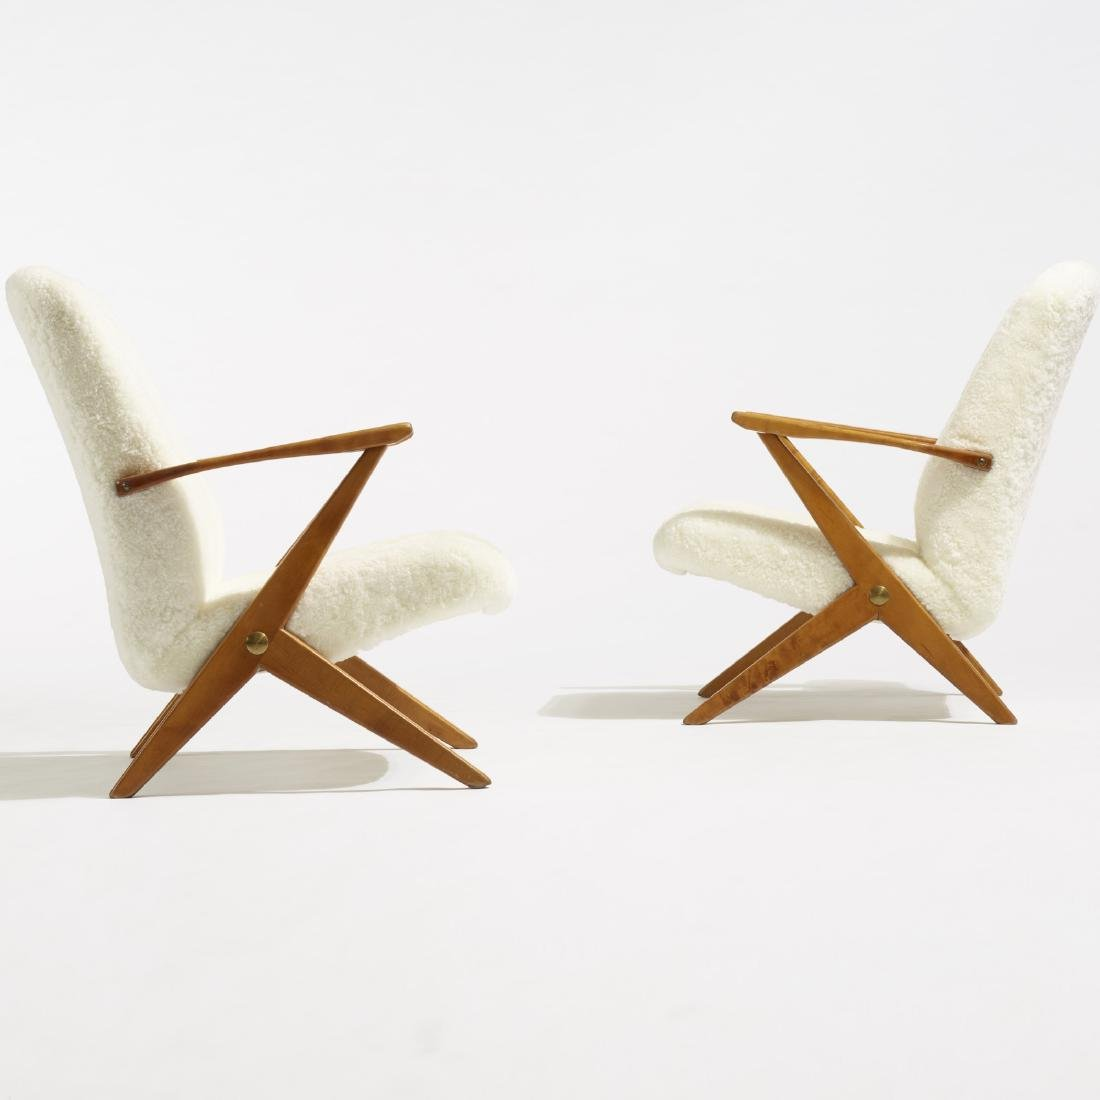 Bengt Ruda, lounge chairs, pair - 3